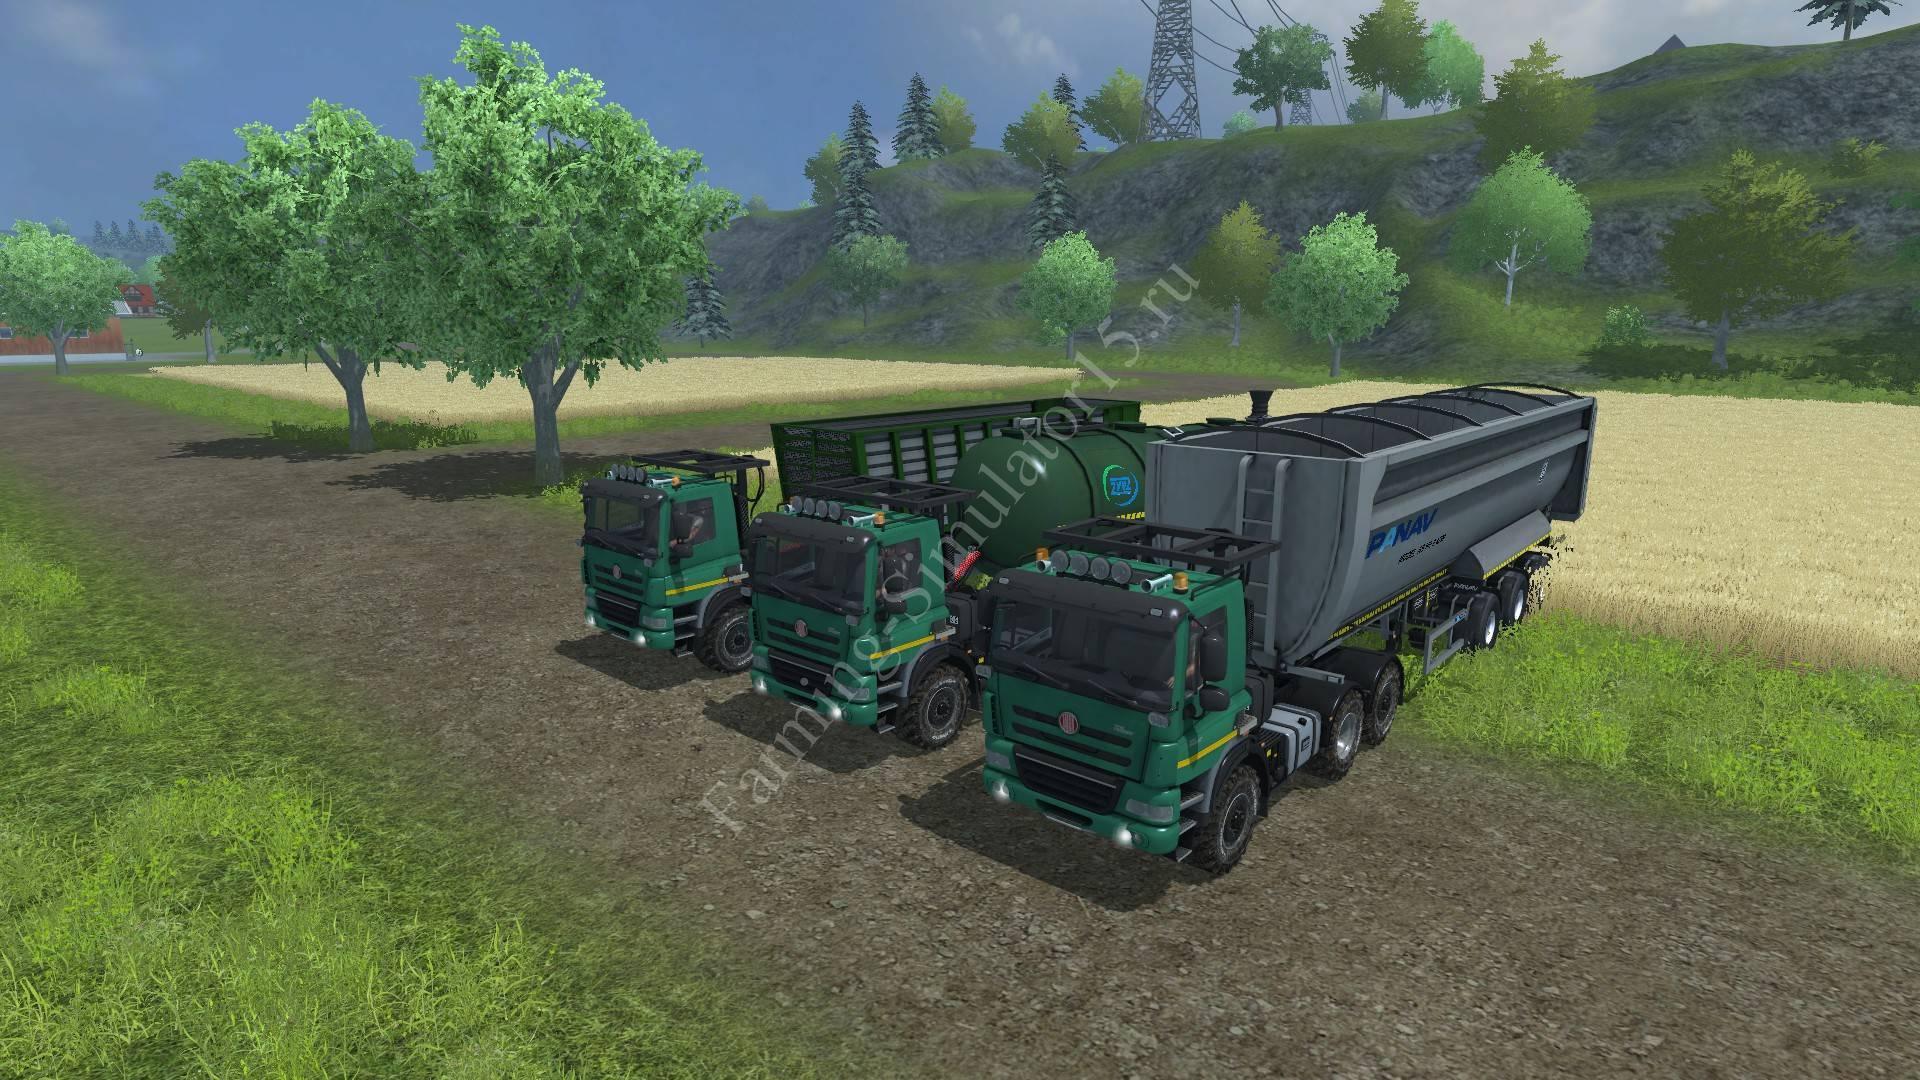 Мод грузовика TATRA 158 Phoenix Agro Truck v 1.1 Farming Simulator 2013, Farming Simulator 13